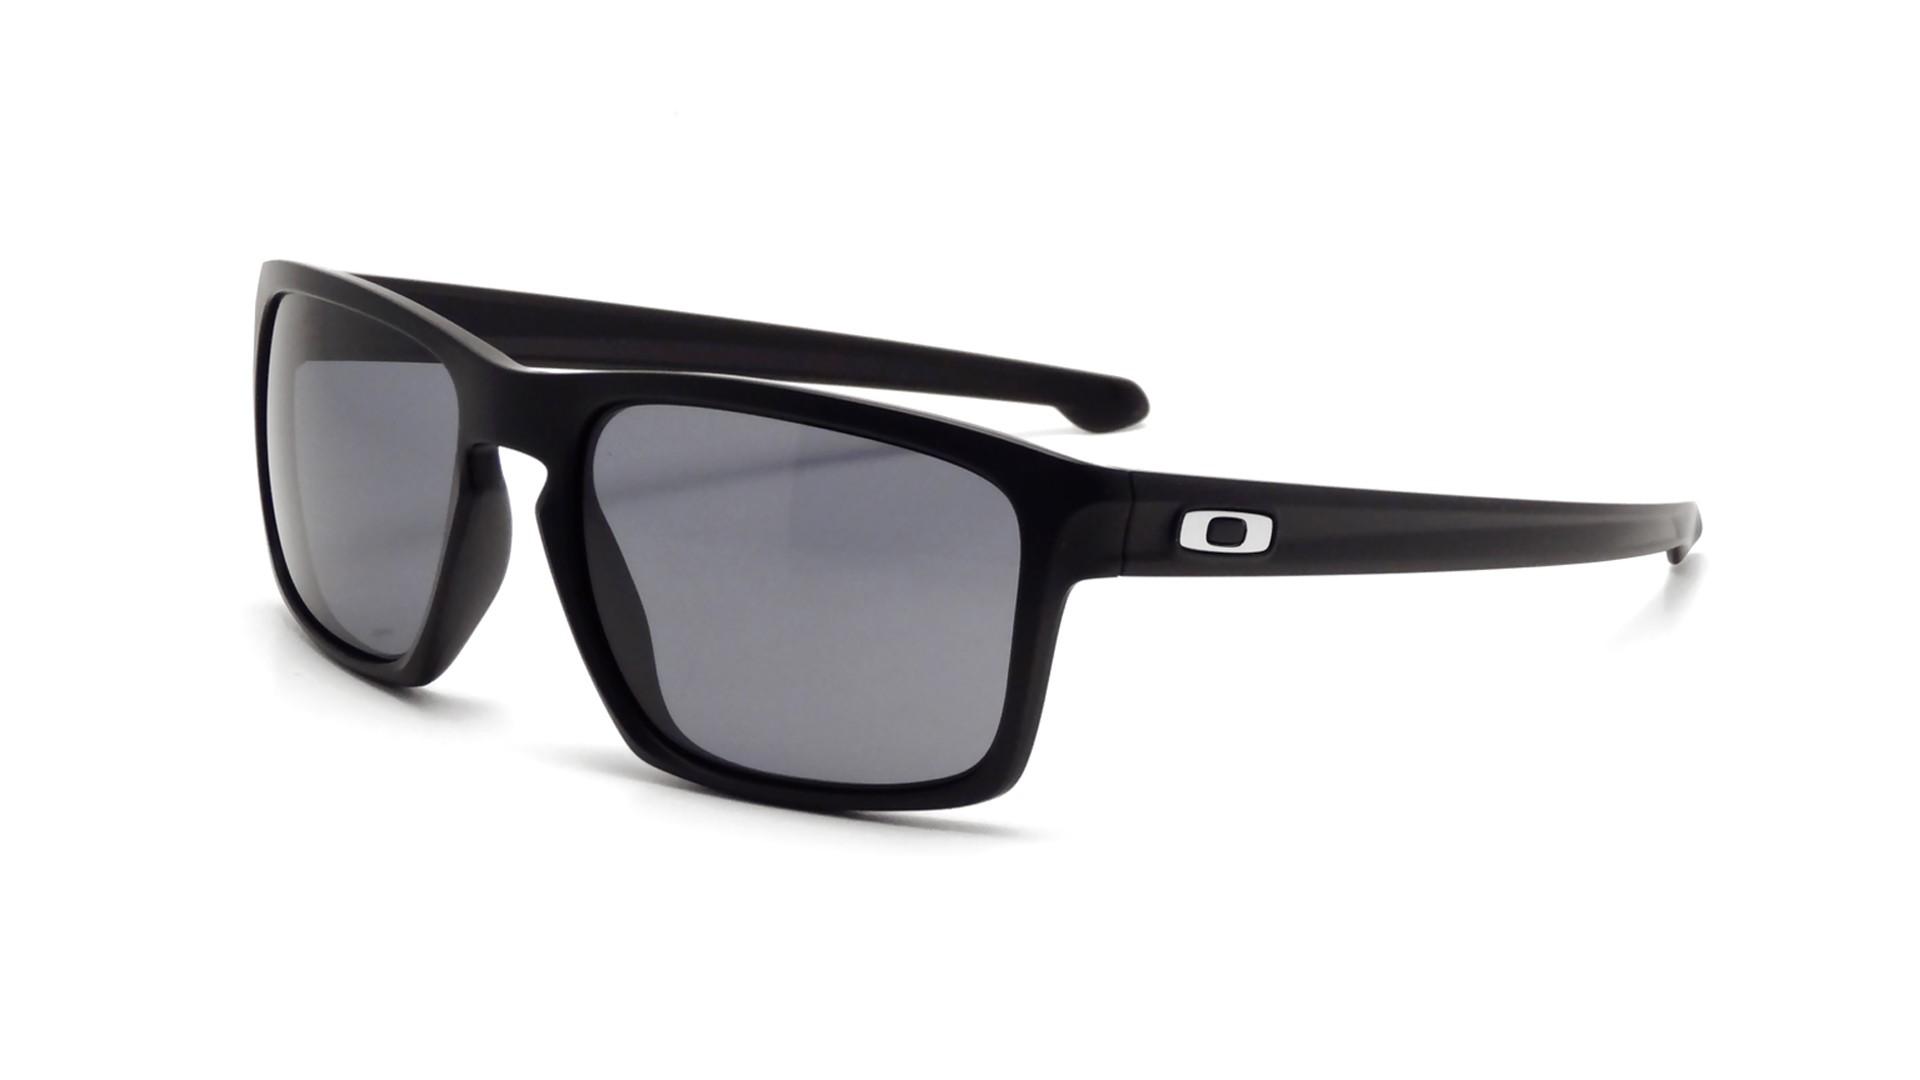 a4b28a84688 Sunglasses Oakley Sliver Black Matte OO9262 01 57-18 Large